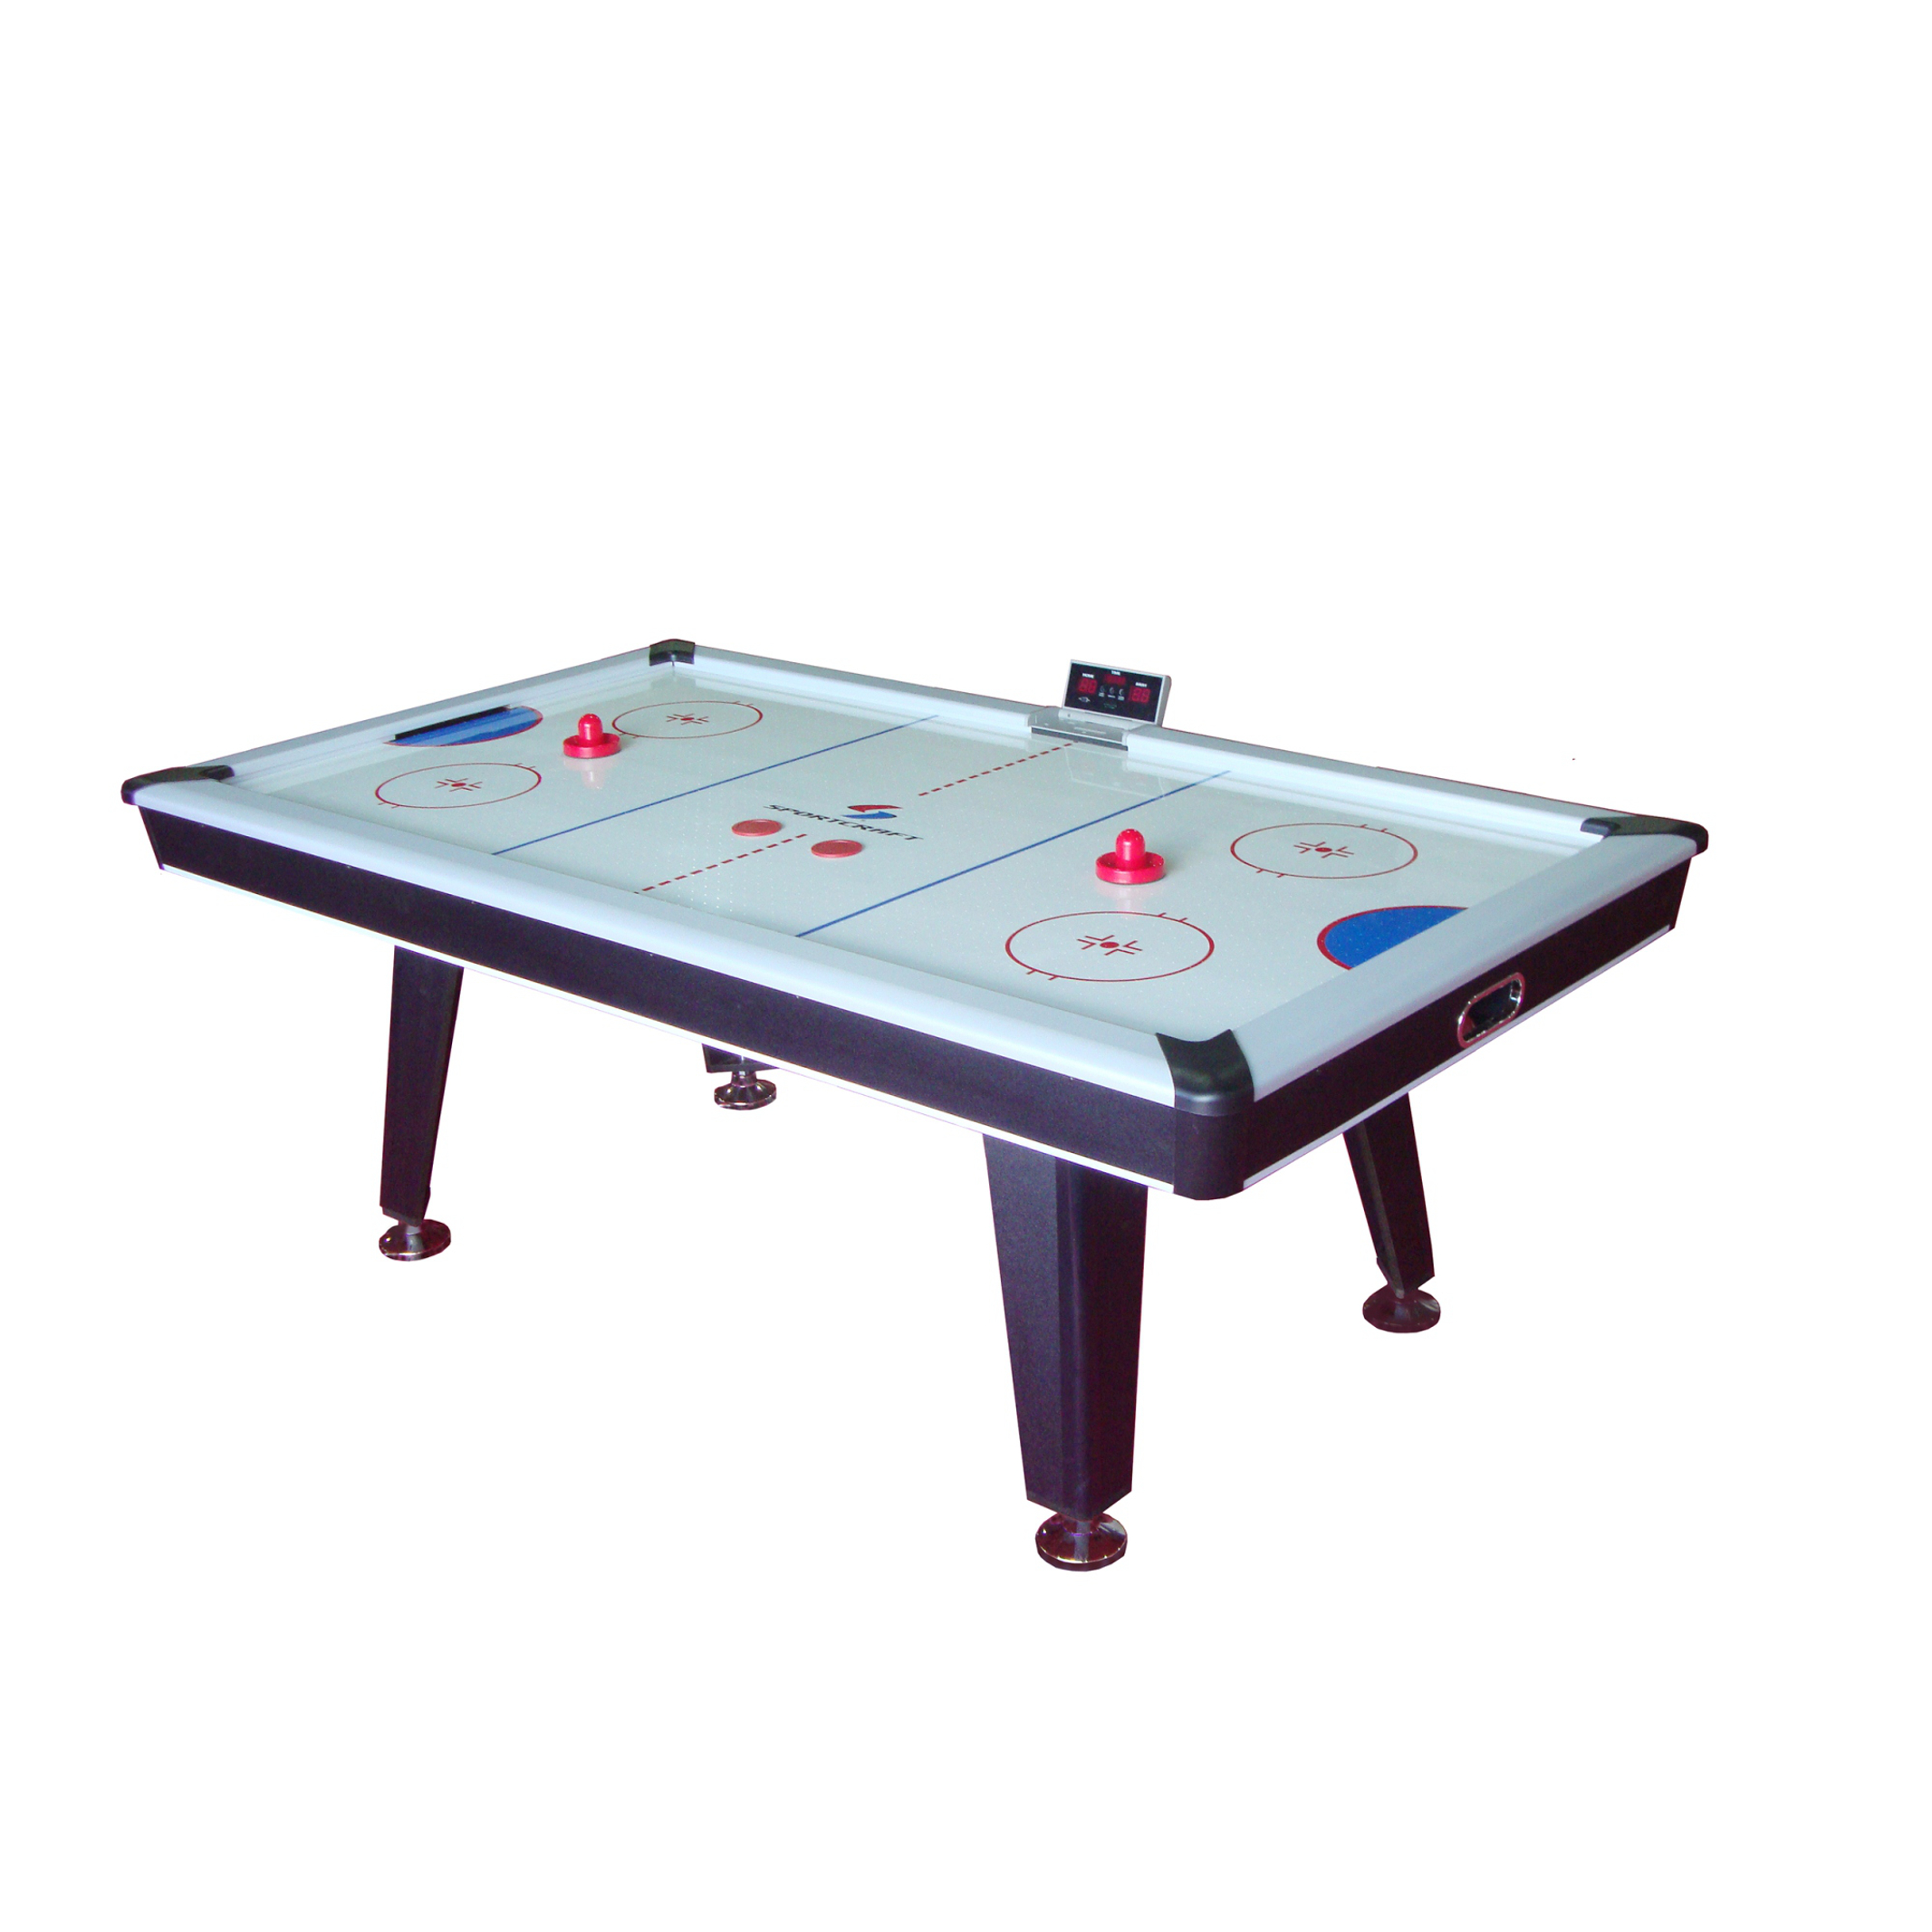 Sportcraft 739 Attacker Air Hockey Table